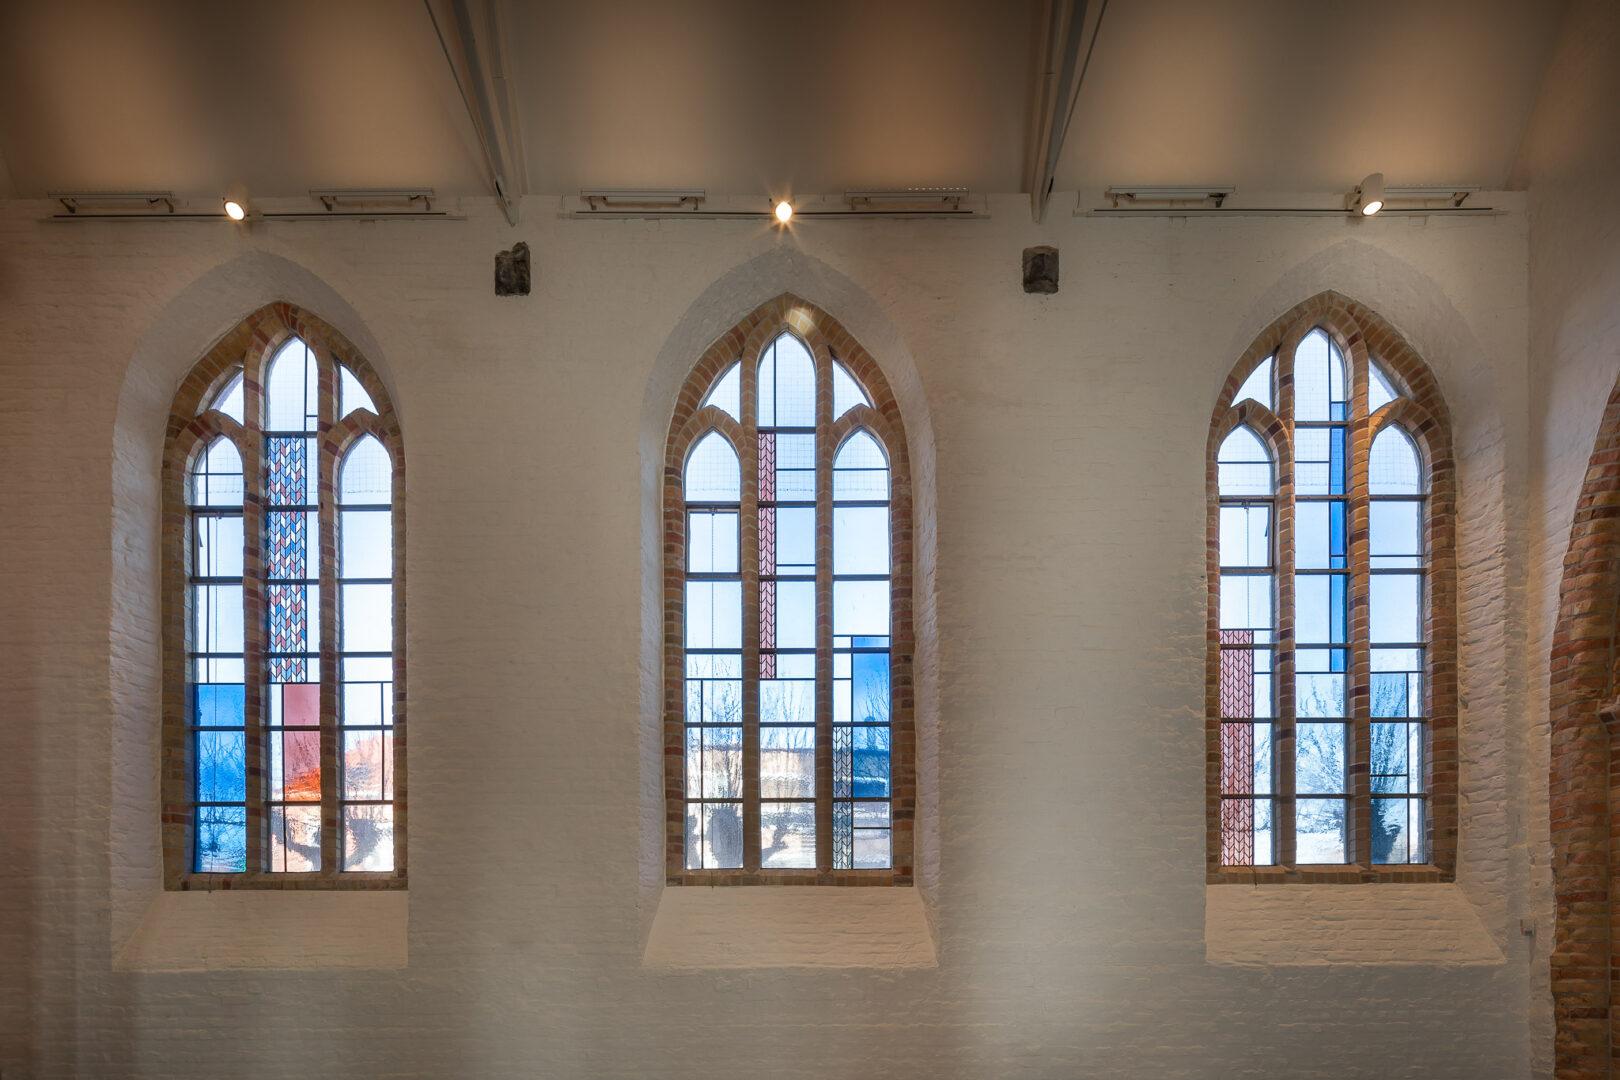 Monumentale glasramen, Sint-Nicolaaskerk, Westkapelle – ontw. Arch. Thibault Florin (Bureau Bressers) – ©Jürgen De Witte